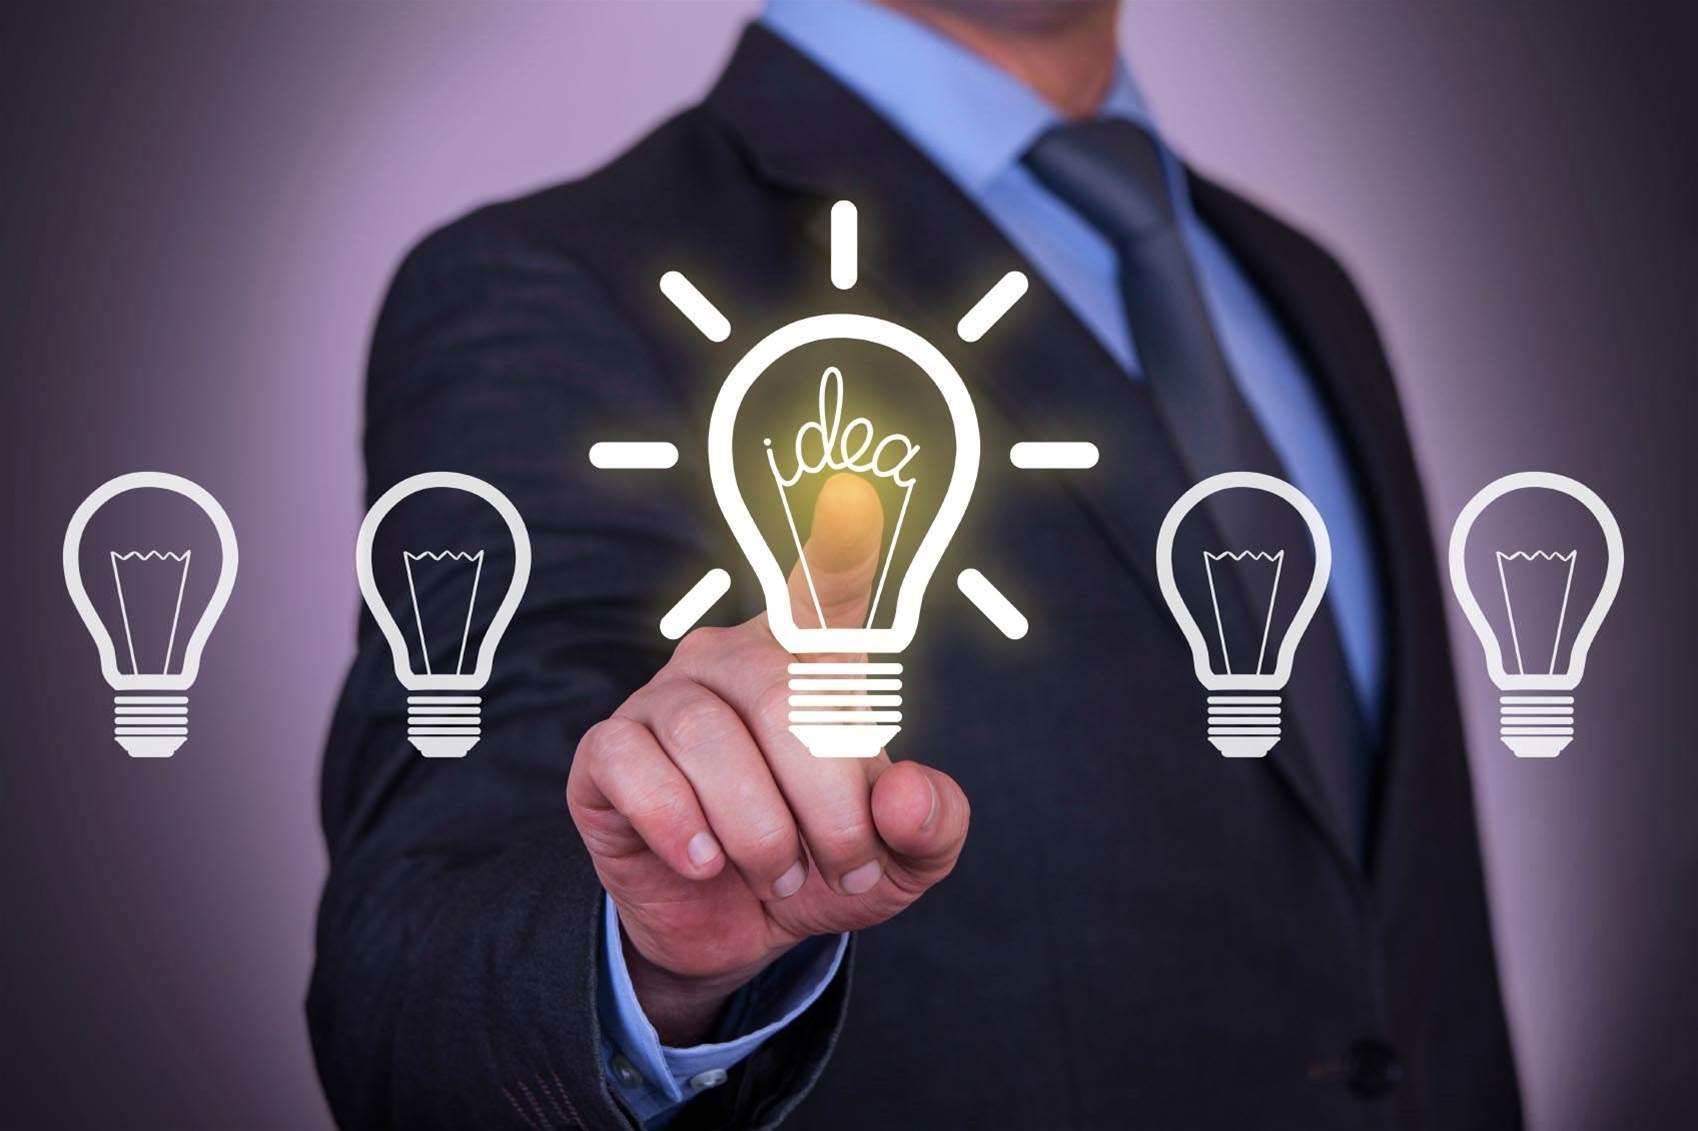 Telstra creates 'digital incubator' to tweak services